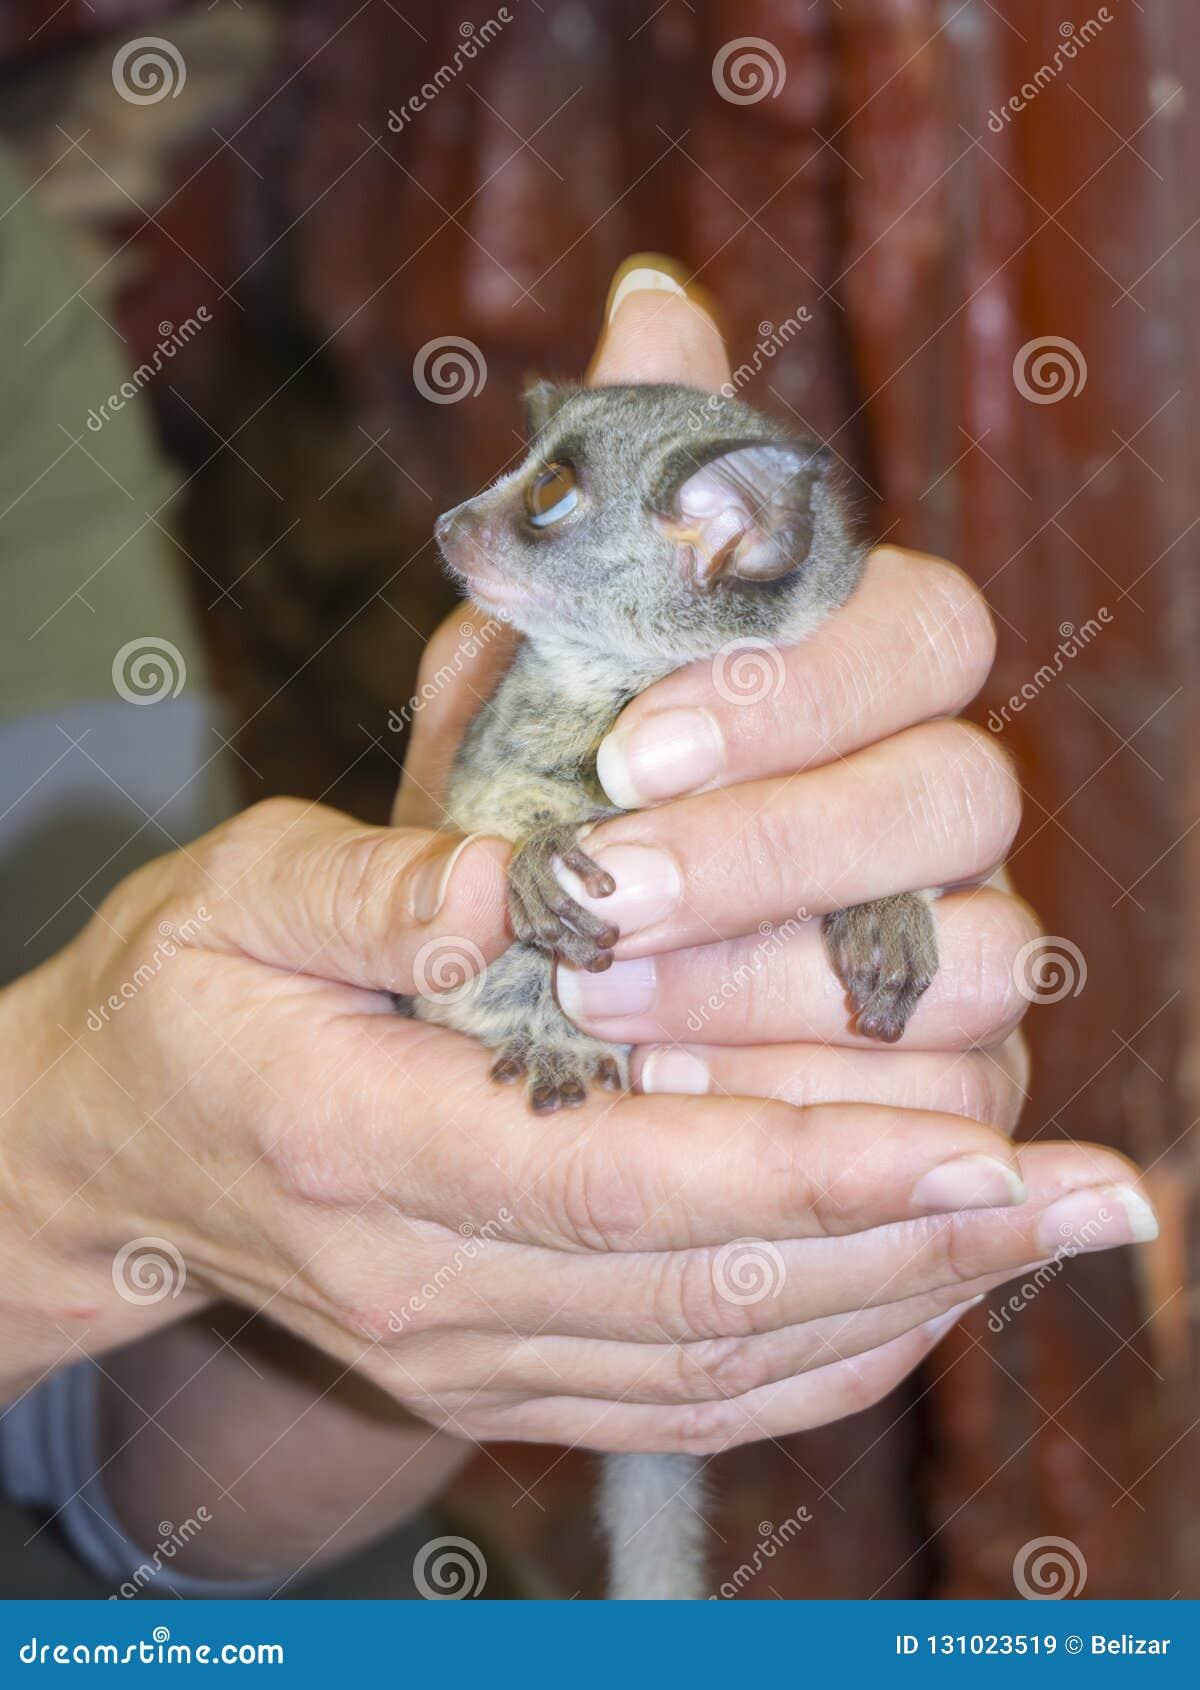 Senegal bushbaby in hand